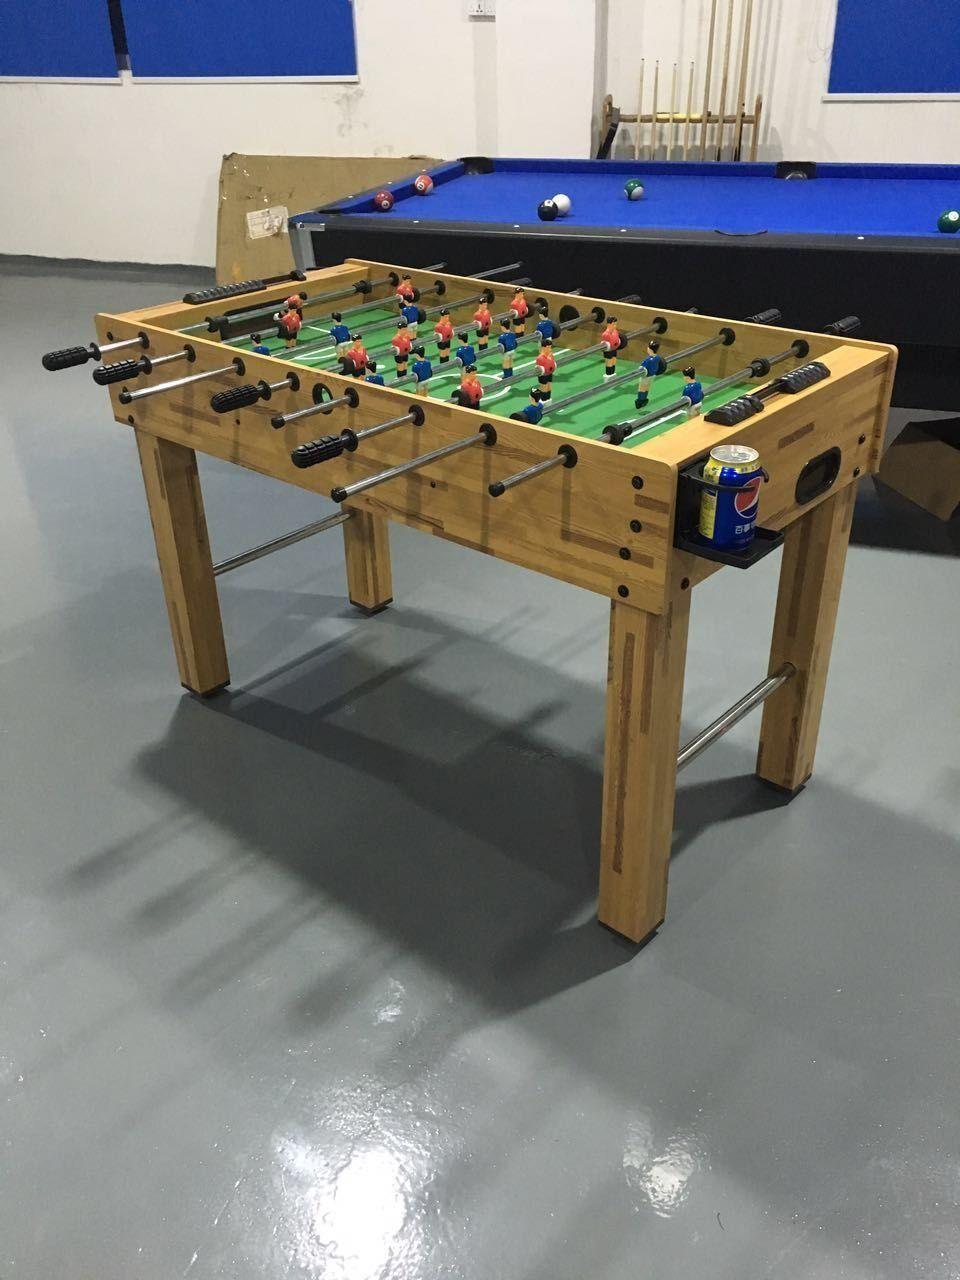 Fieldsheer #soccer Game Table / Foosball Table Boot Boy BB 606 In